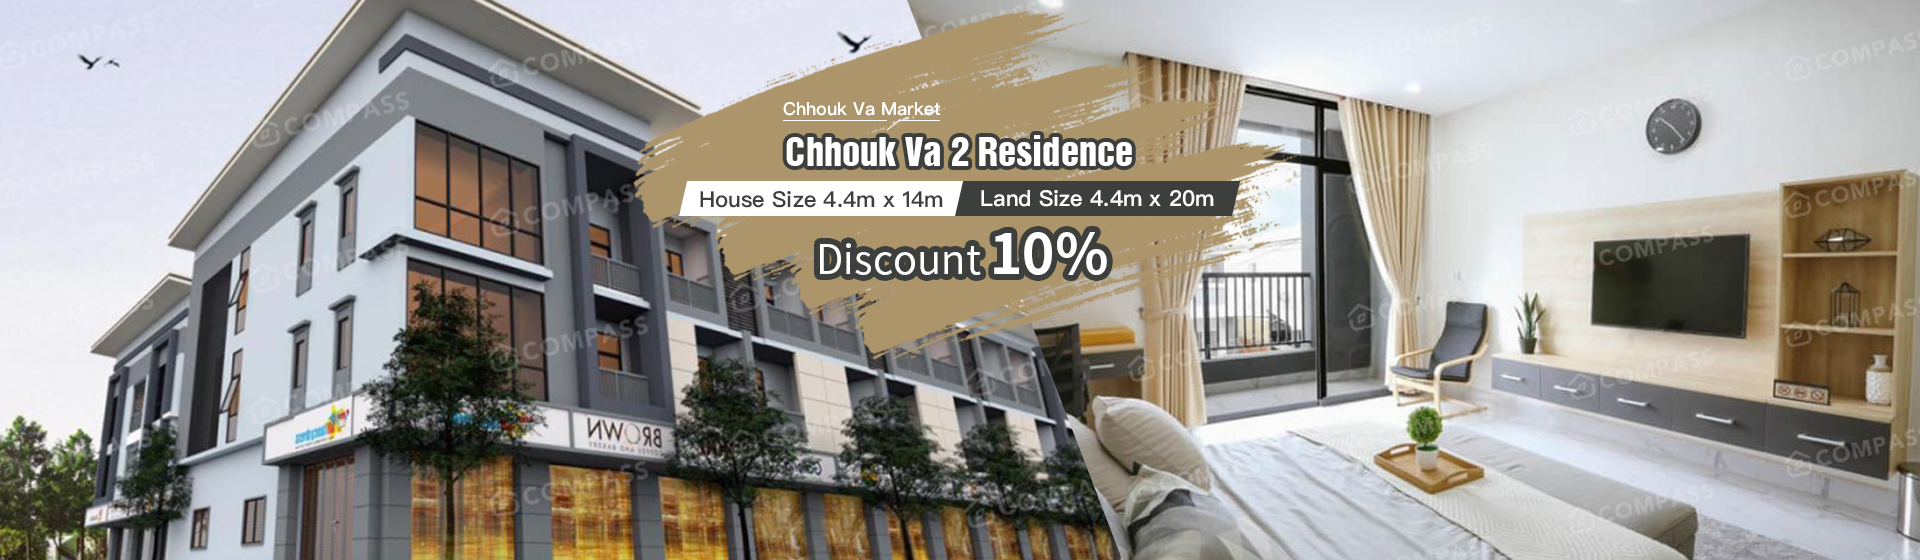 Chhouk Va 2 Residence